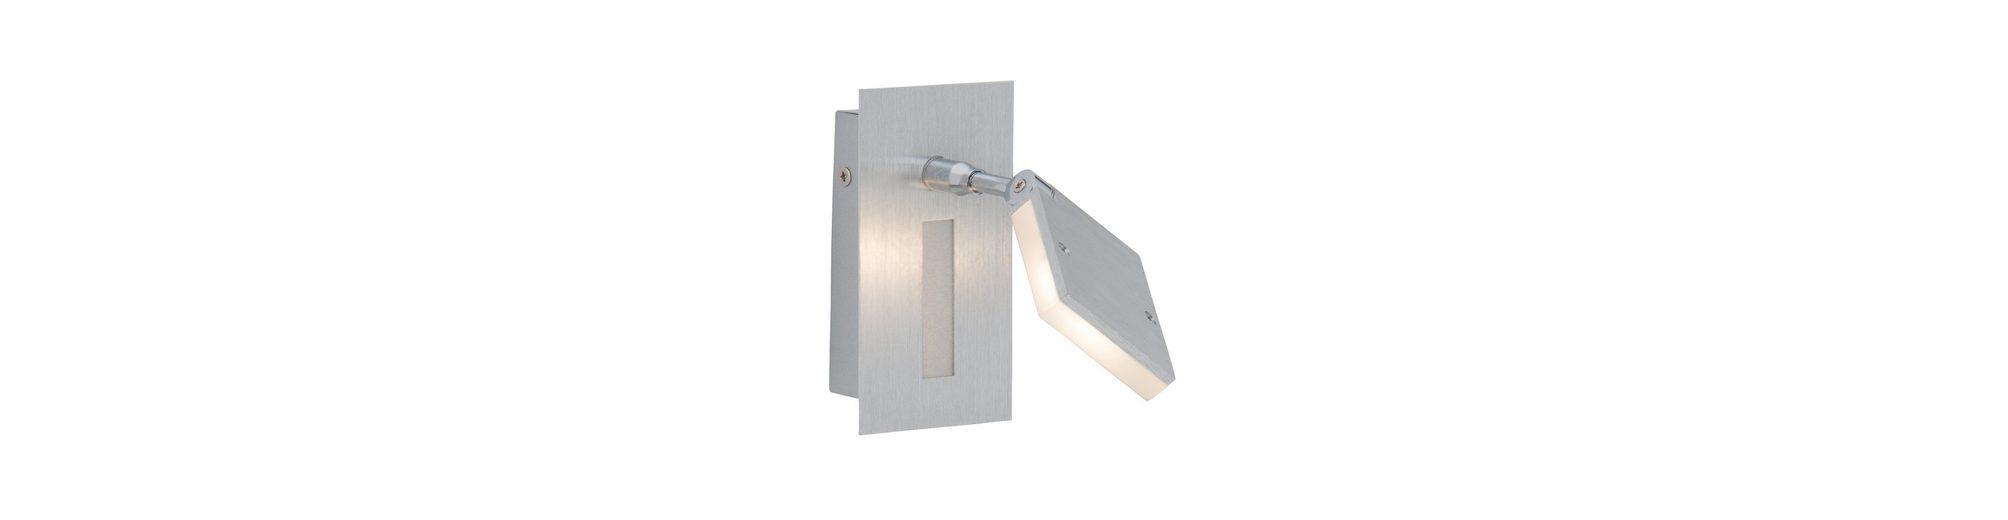 Brilliant Leuchten Wandleuchte, inkl. LED-Leuchtmittel, 1 flammig